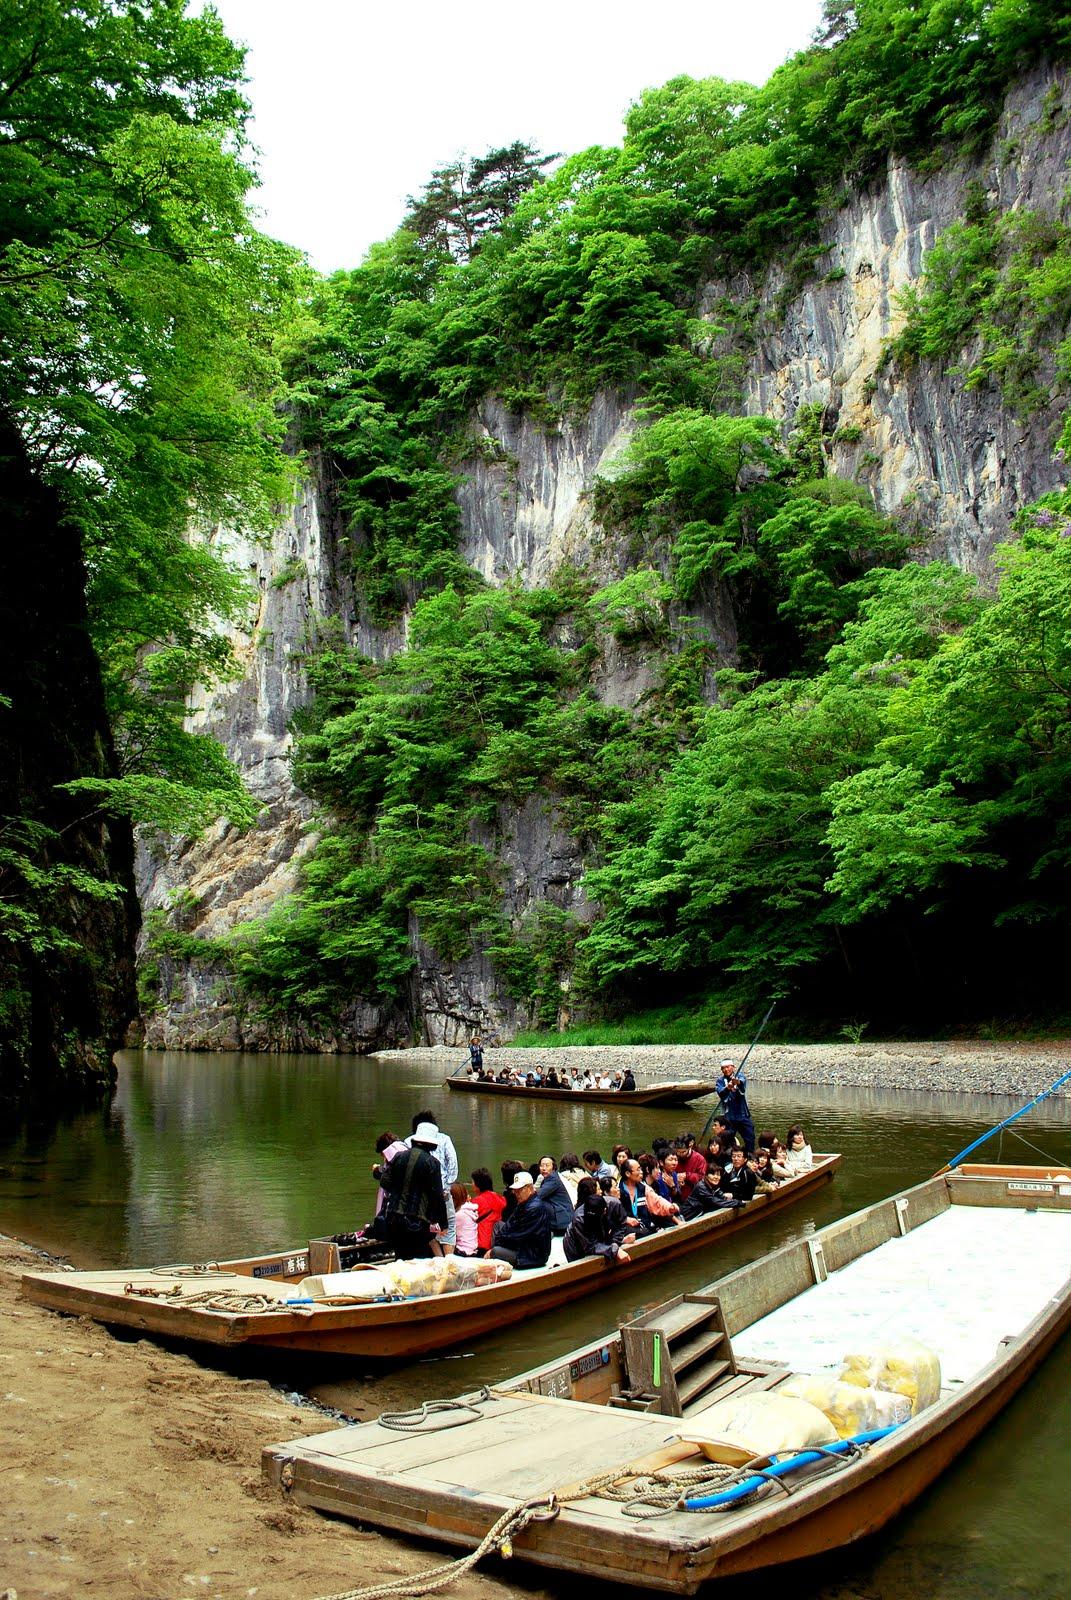 Geibikei, Travel to Ichinoseki